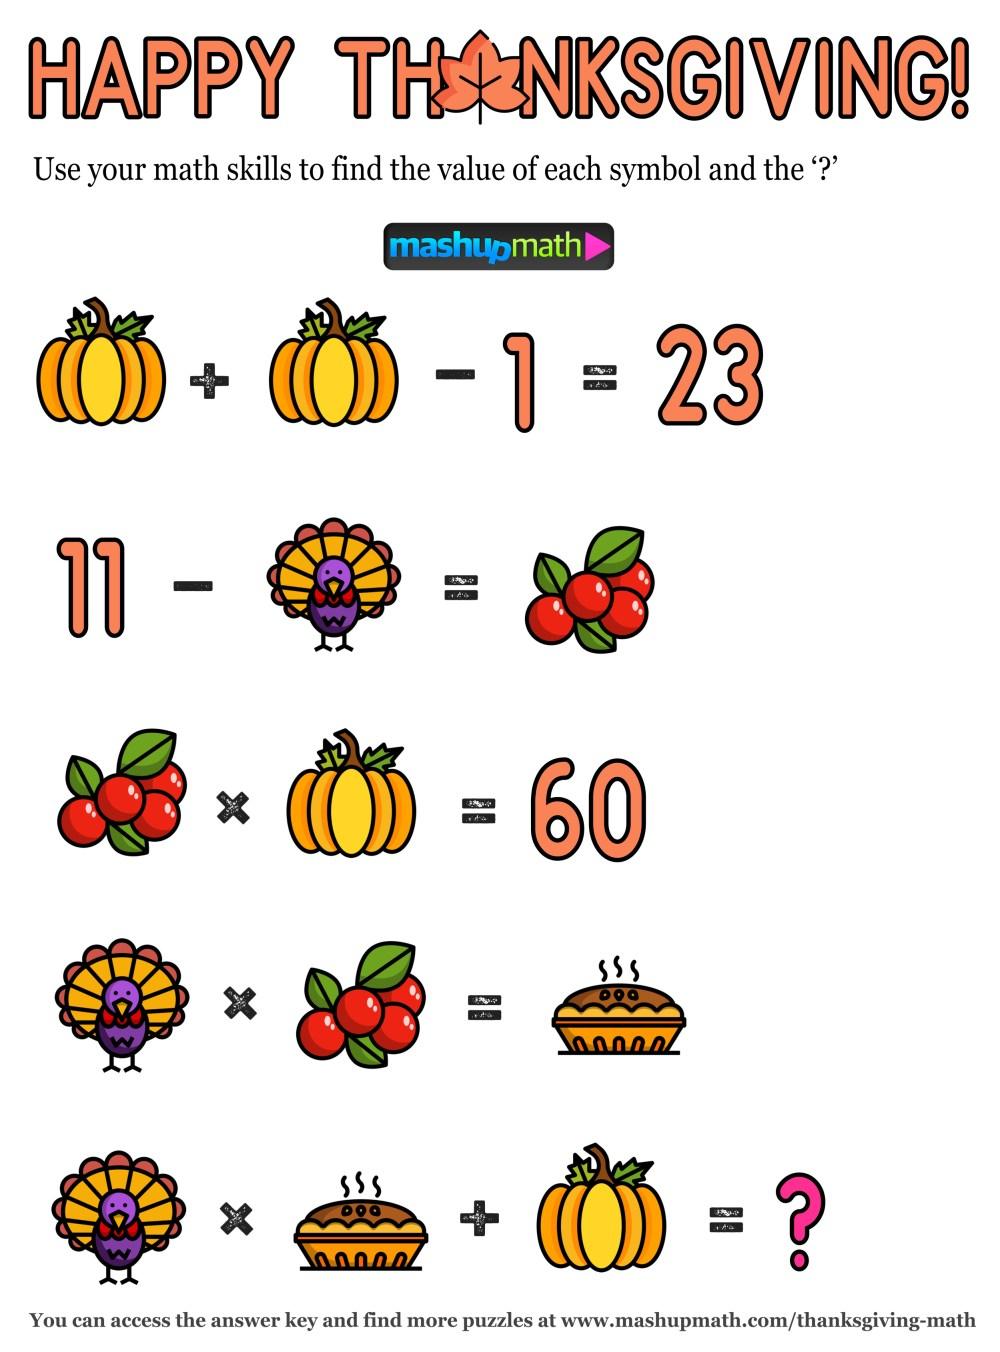 medium resolution of 12 Thanksgiving Math Activities for Grades 1-8 — Mashup Math